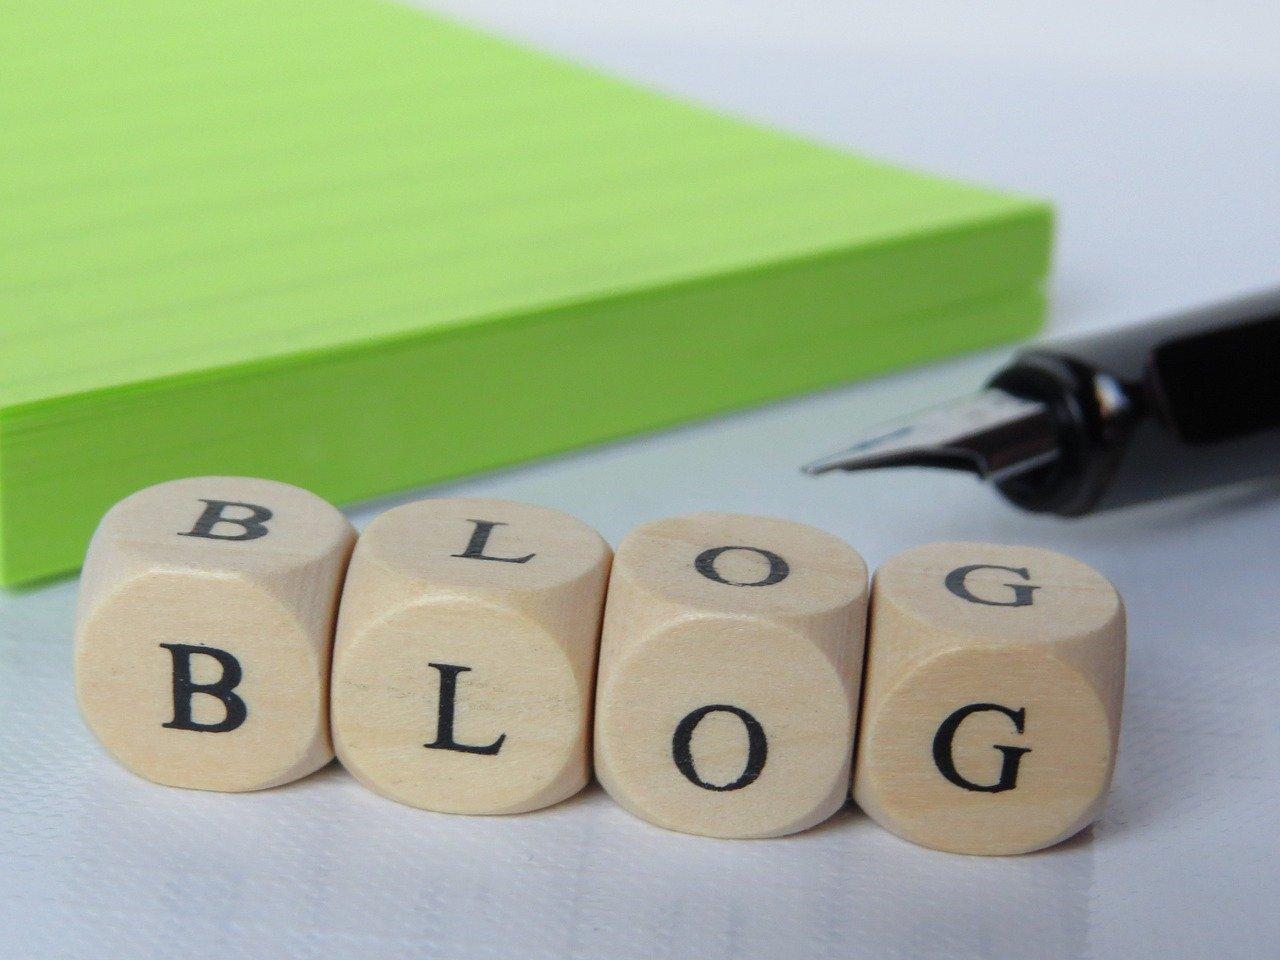 Création d'un site Internet La Ciotat avec WordPress